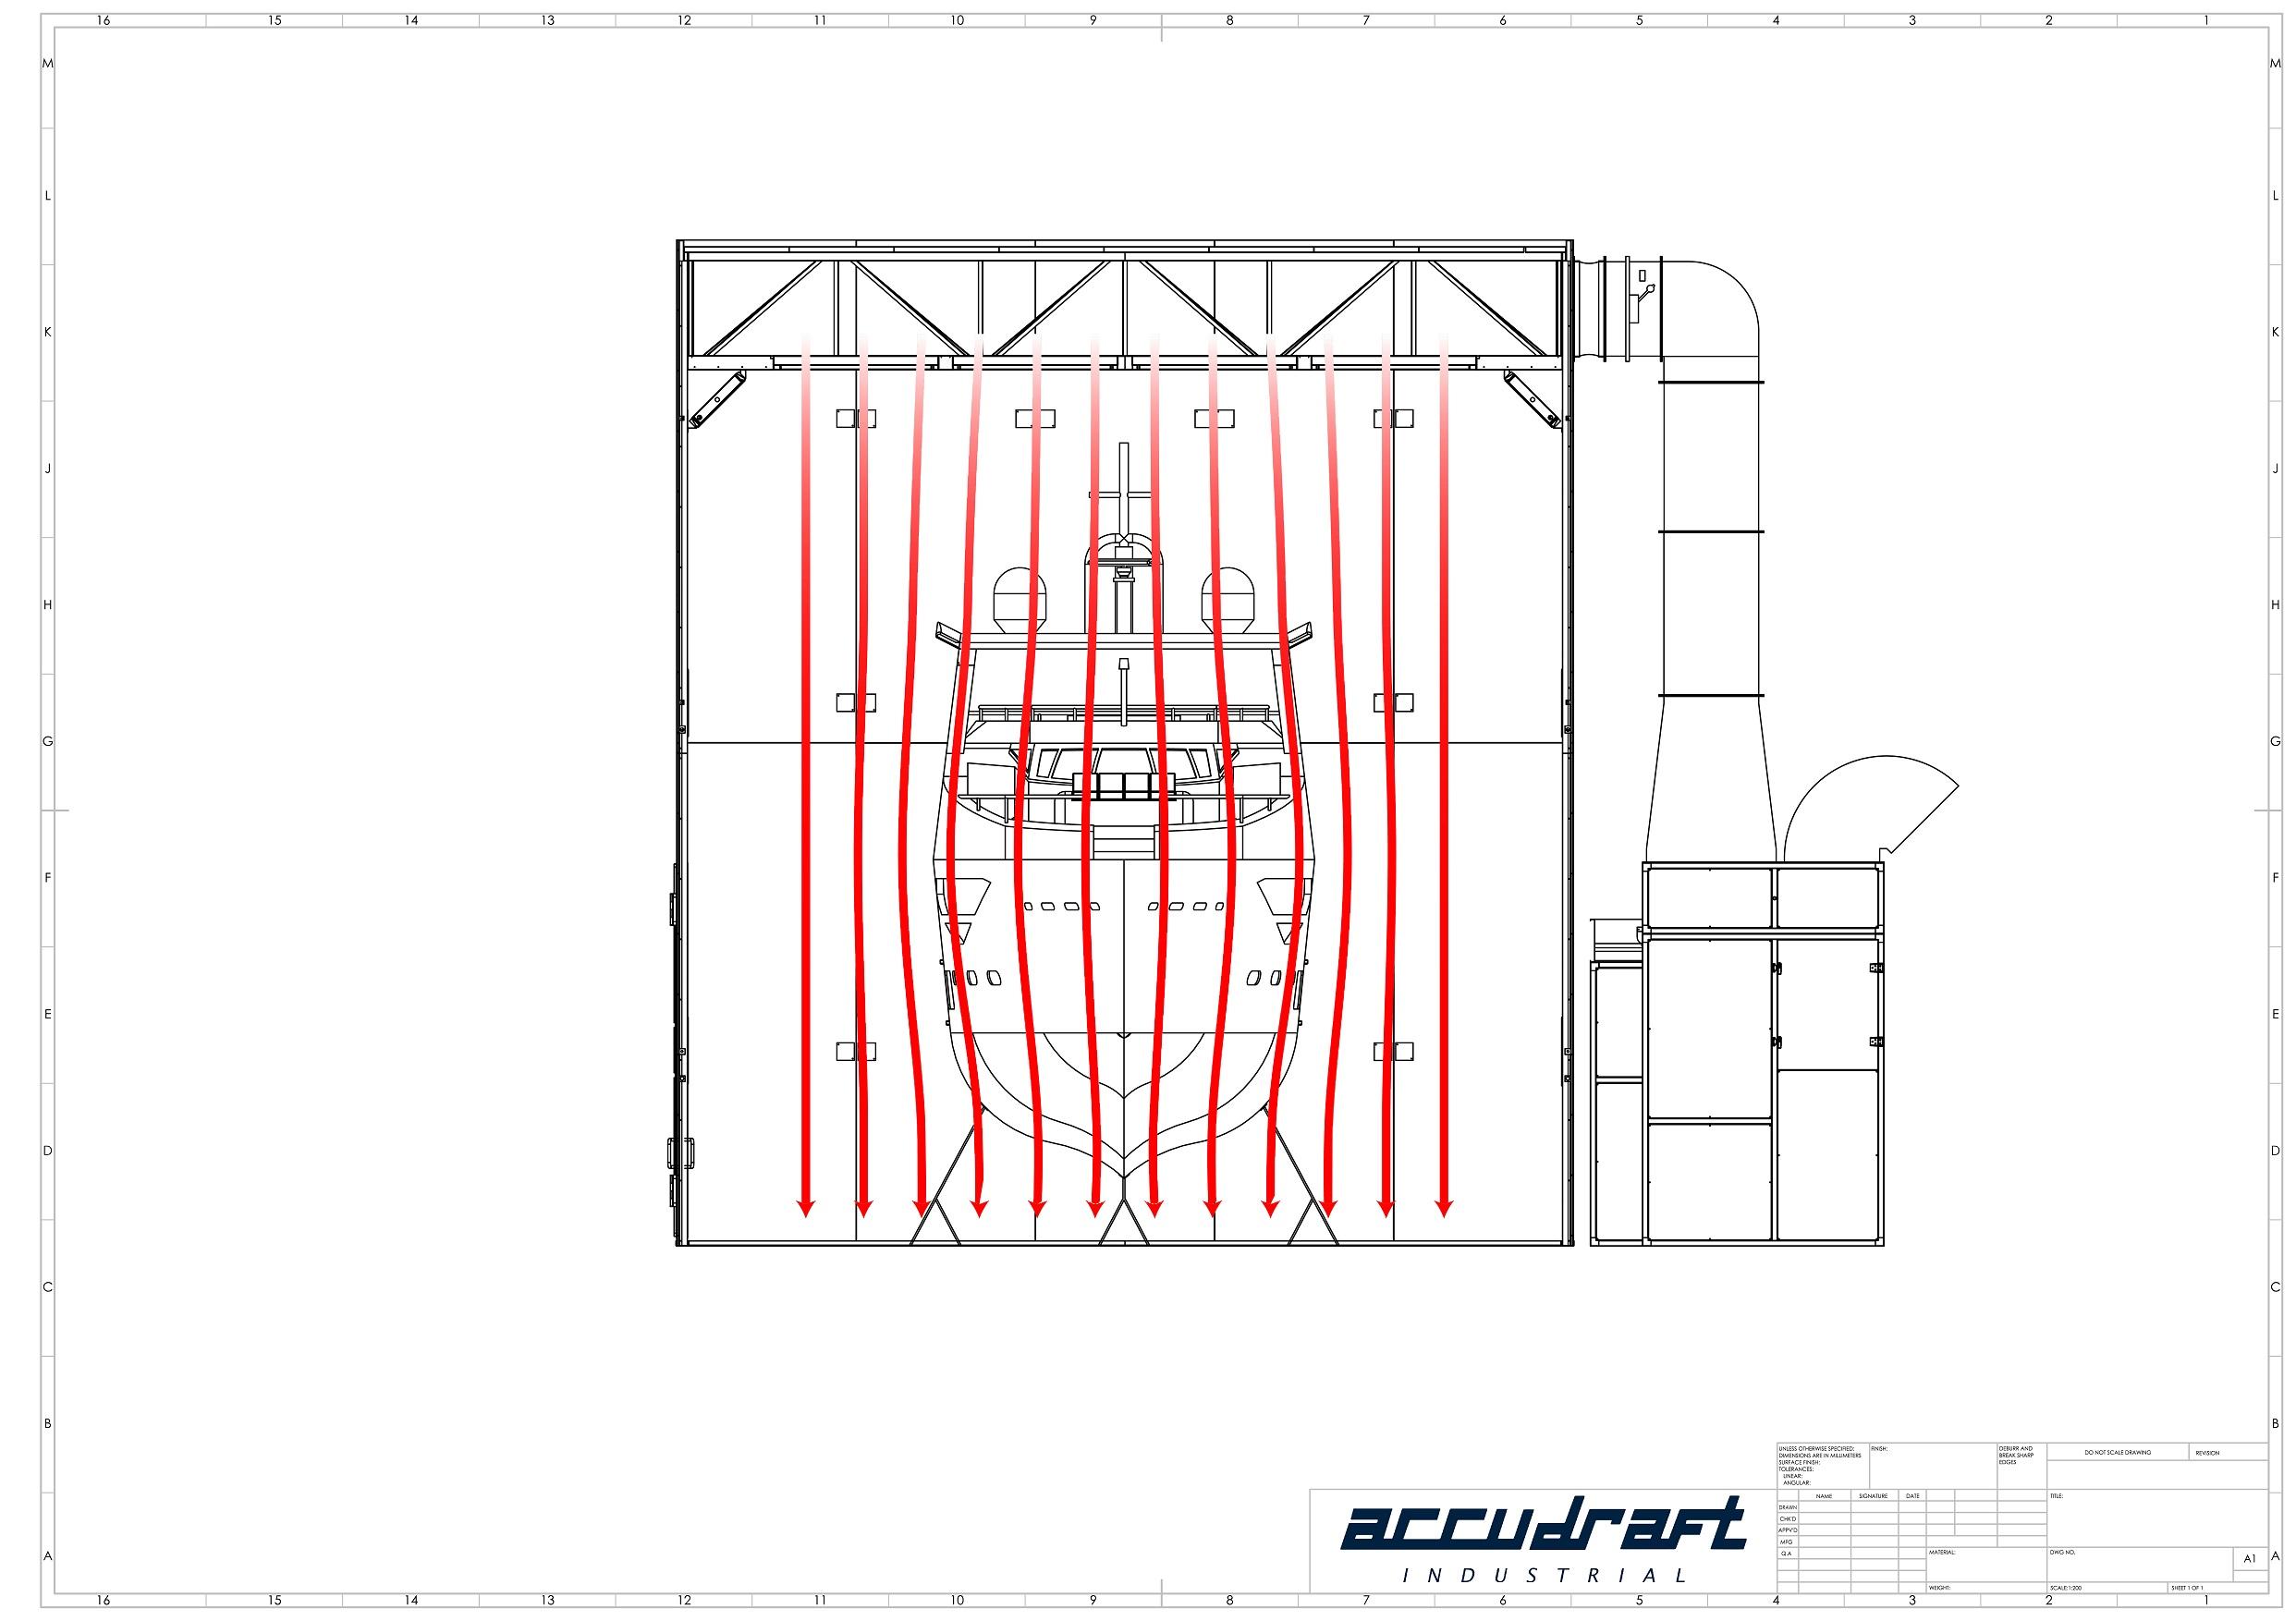 Marine paint booth airflow design